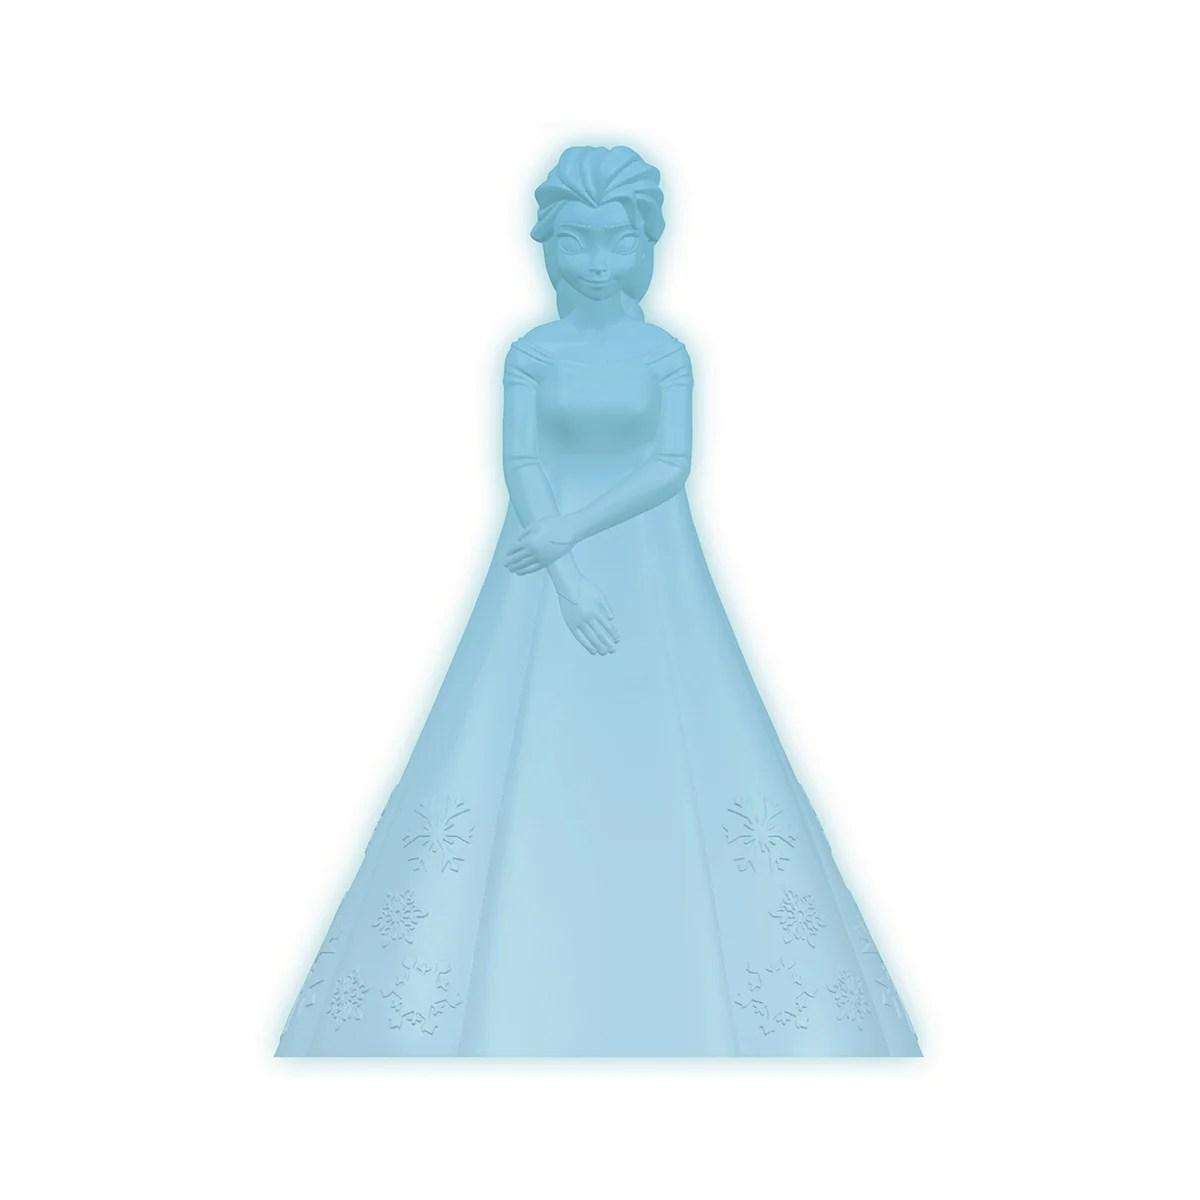 Lampa de veghe Disney Frozen, Elsa